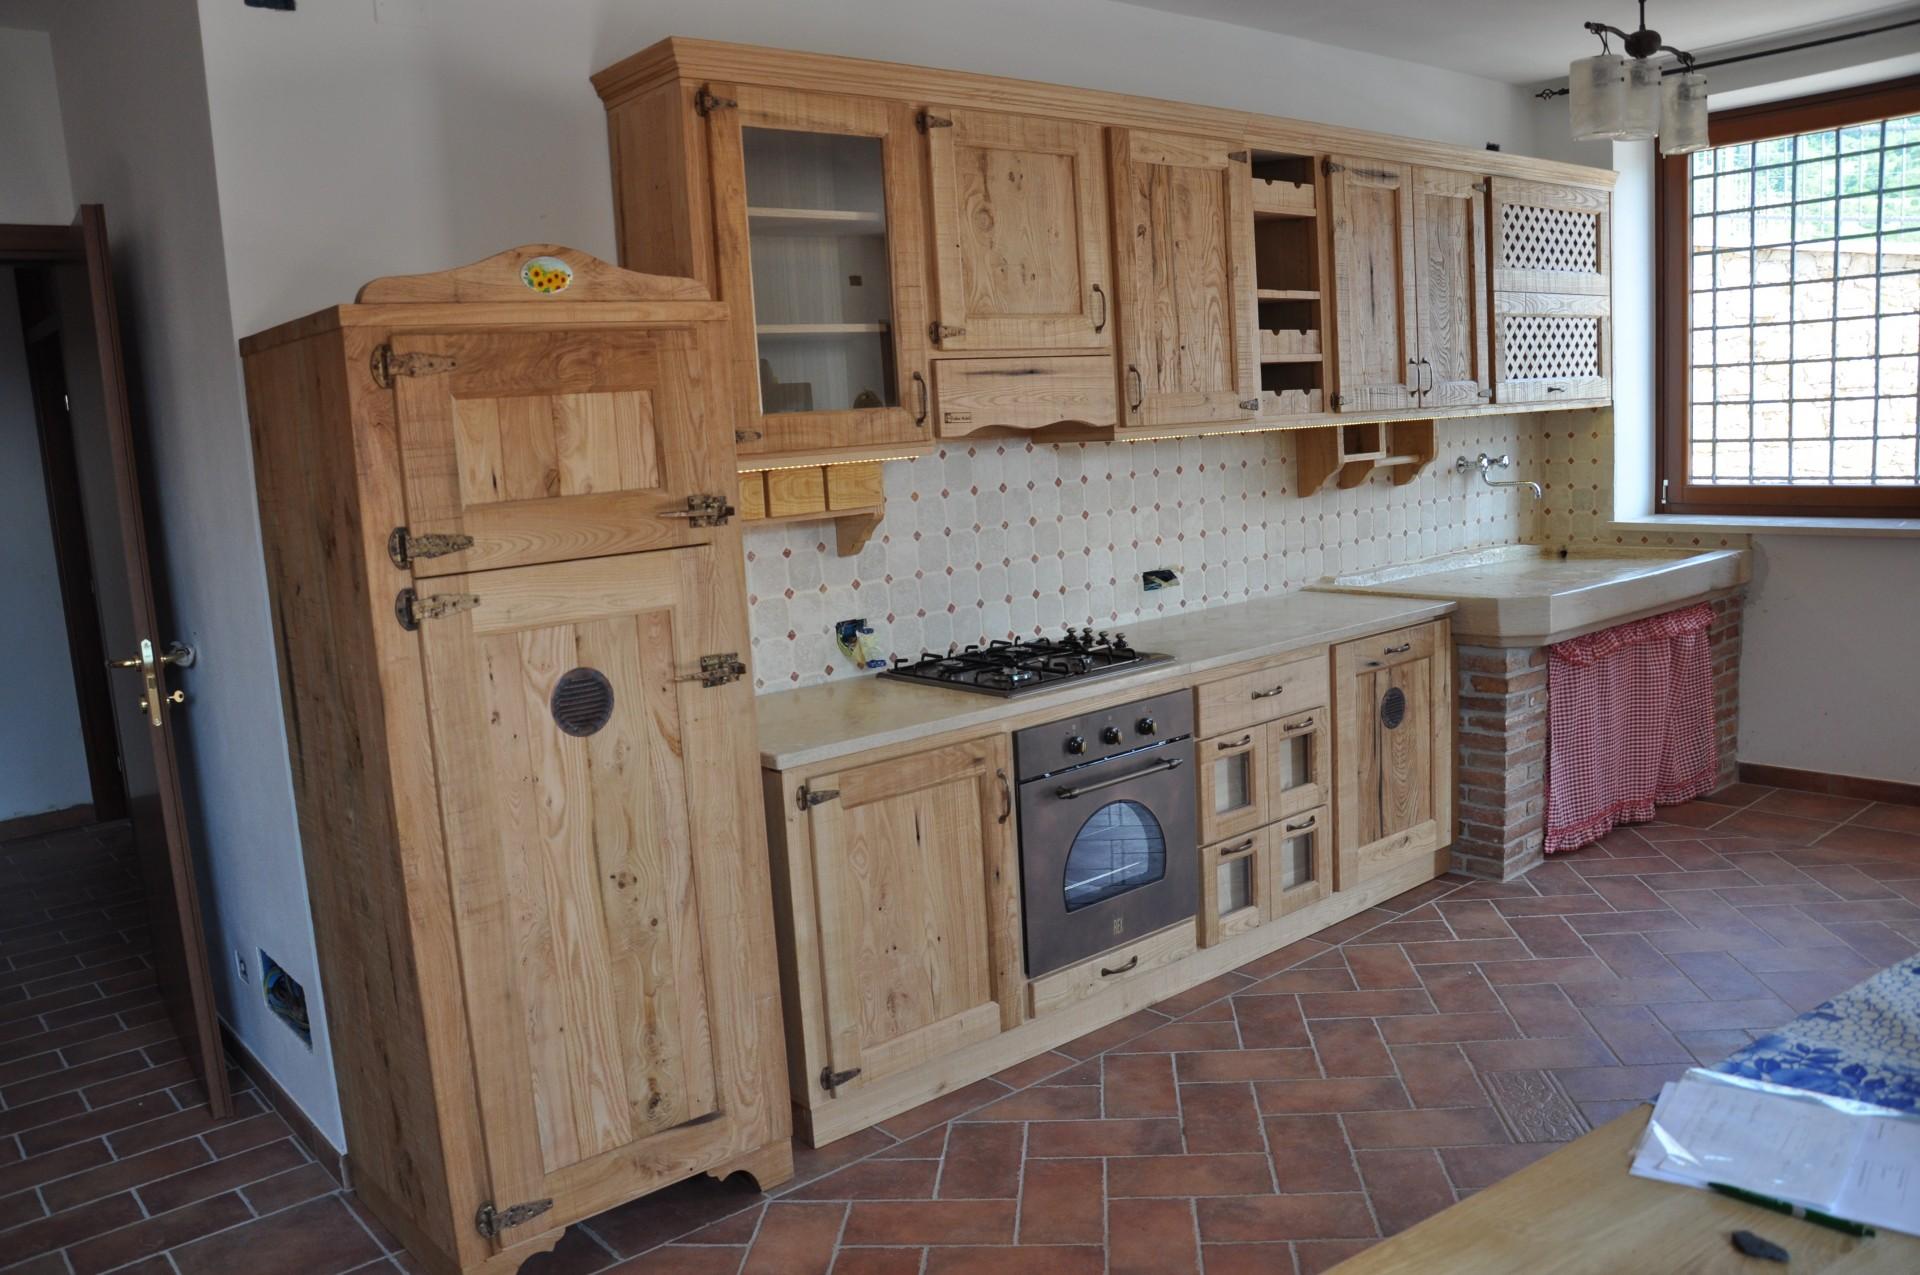 Cucina rustica in castagno fadini mobili cerea verona - Mobili rustici per cucina ...